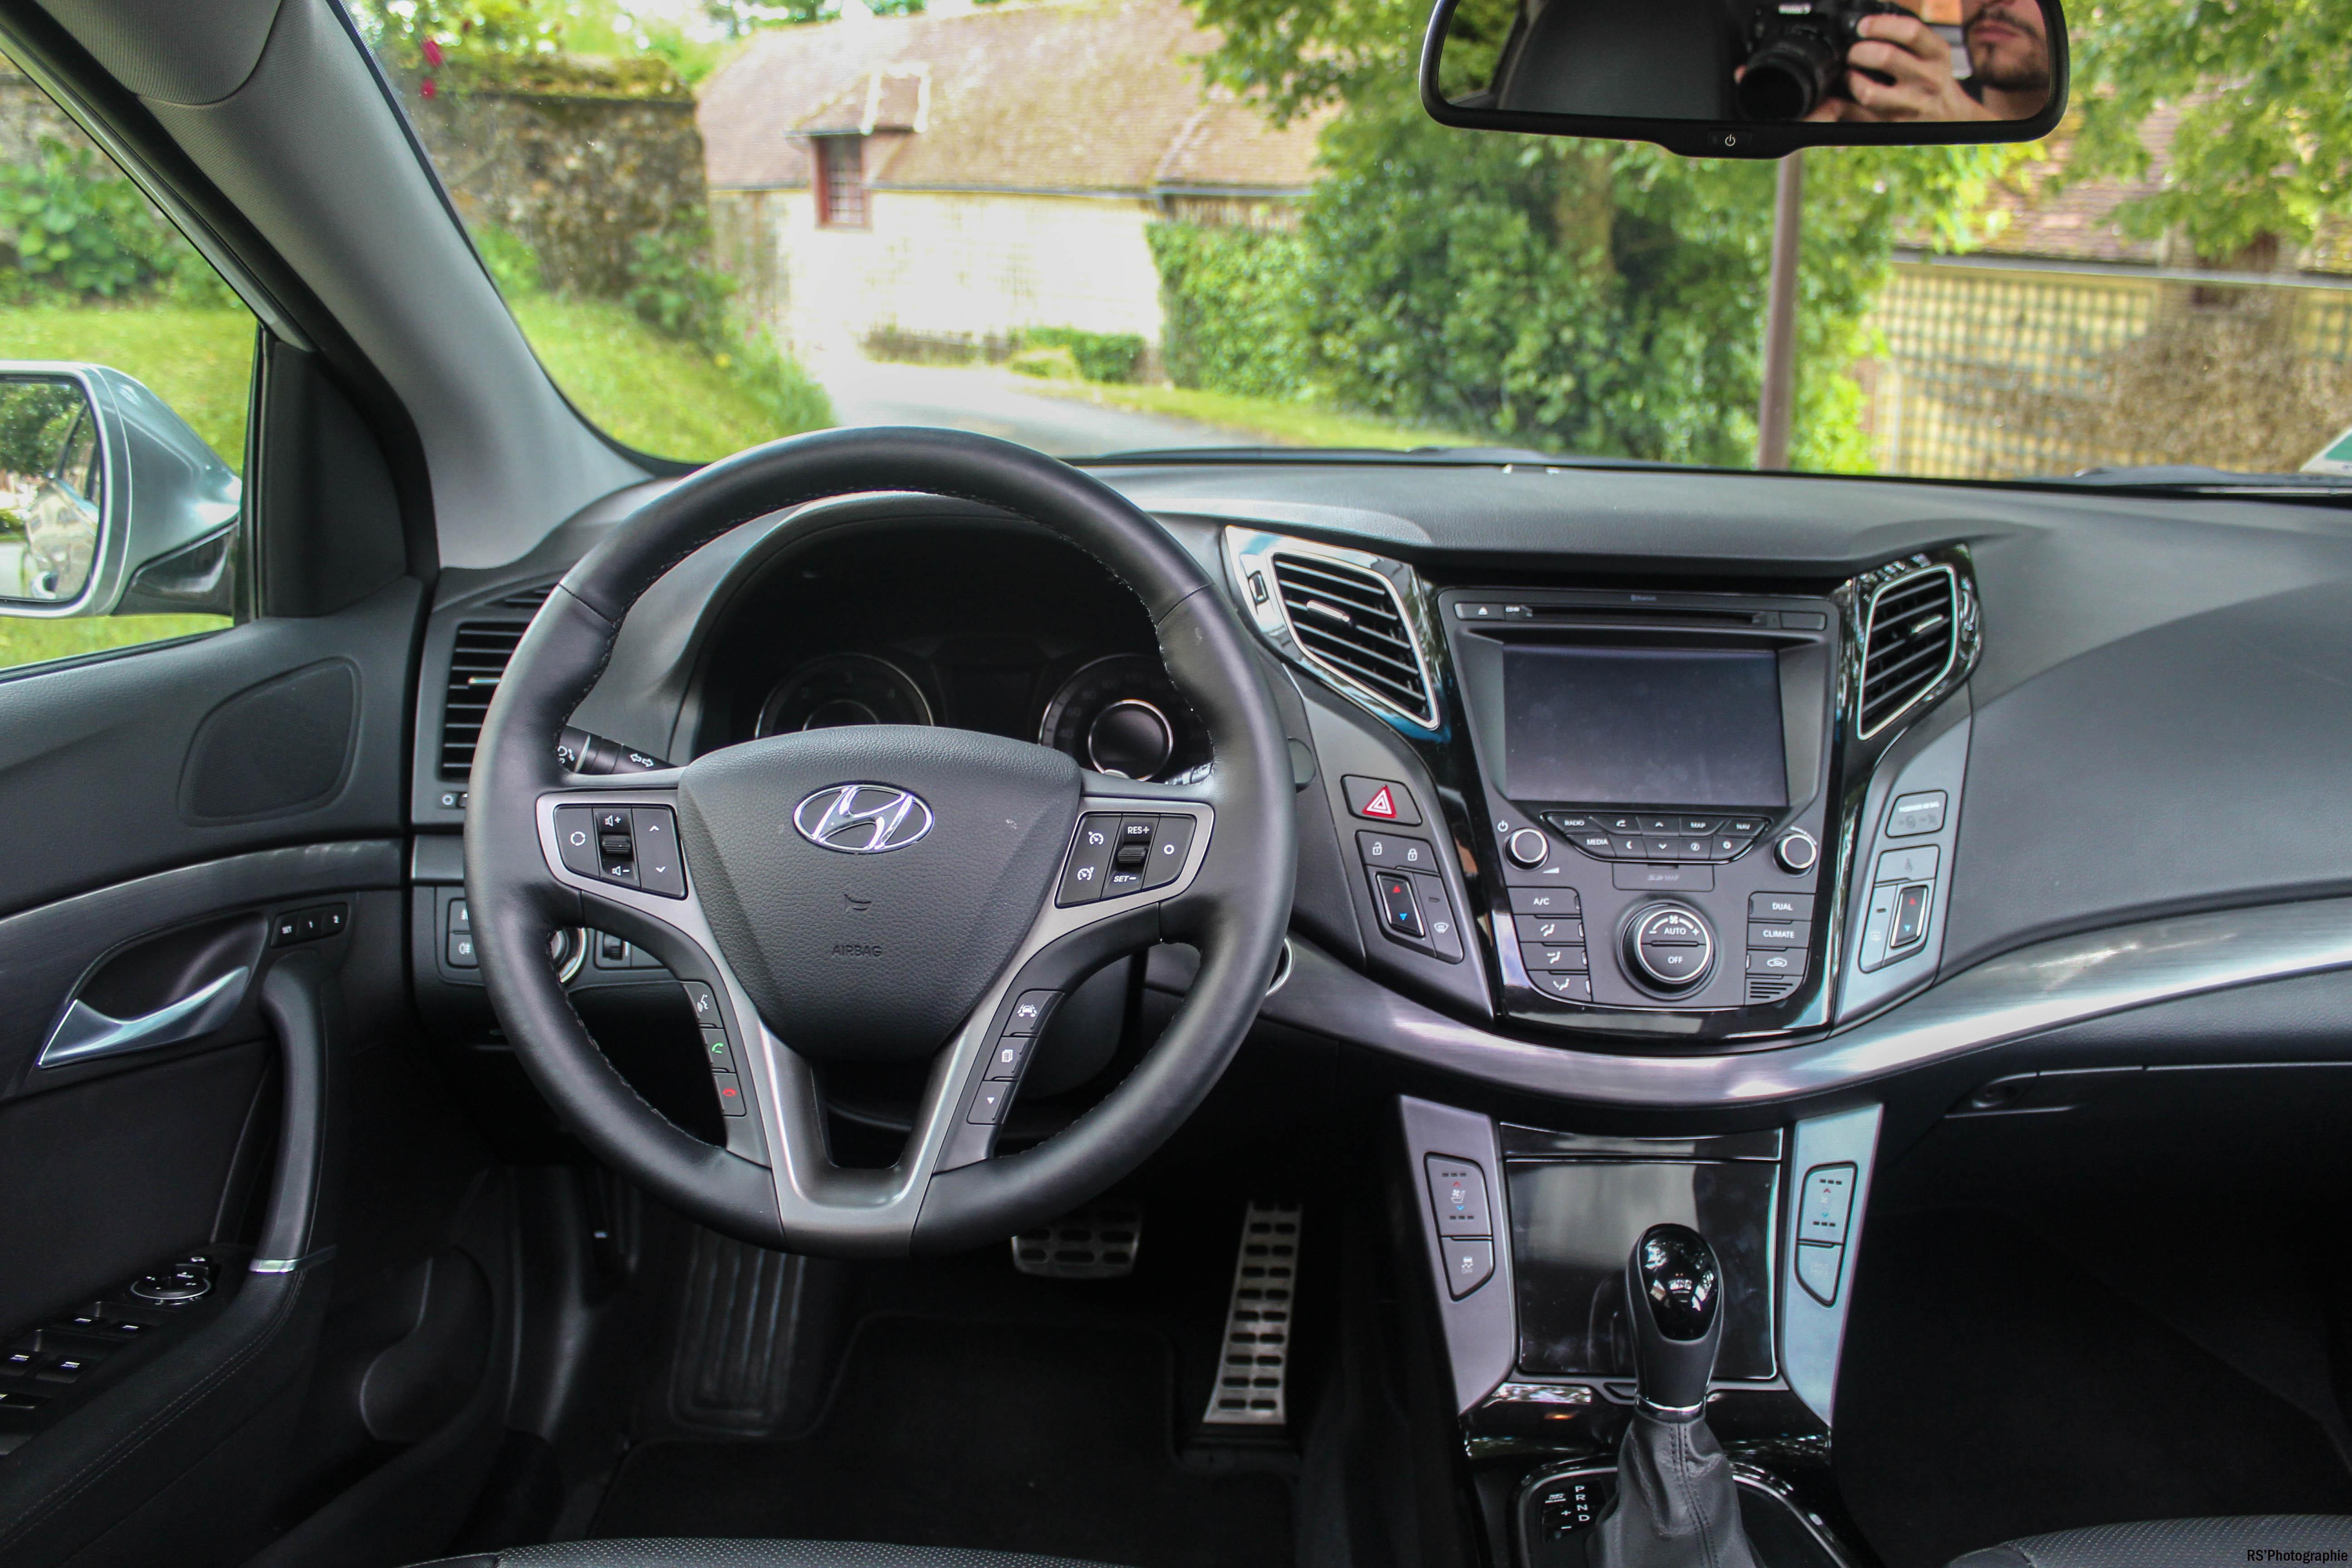 Hyundaii40SW18-hyundai-i40-sw-intérieur-onboard-arnaud-demasier-RSPhotographie